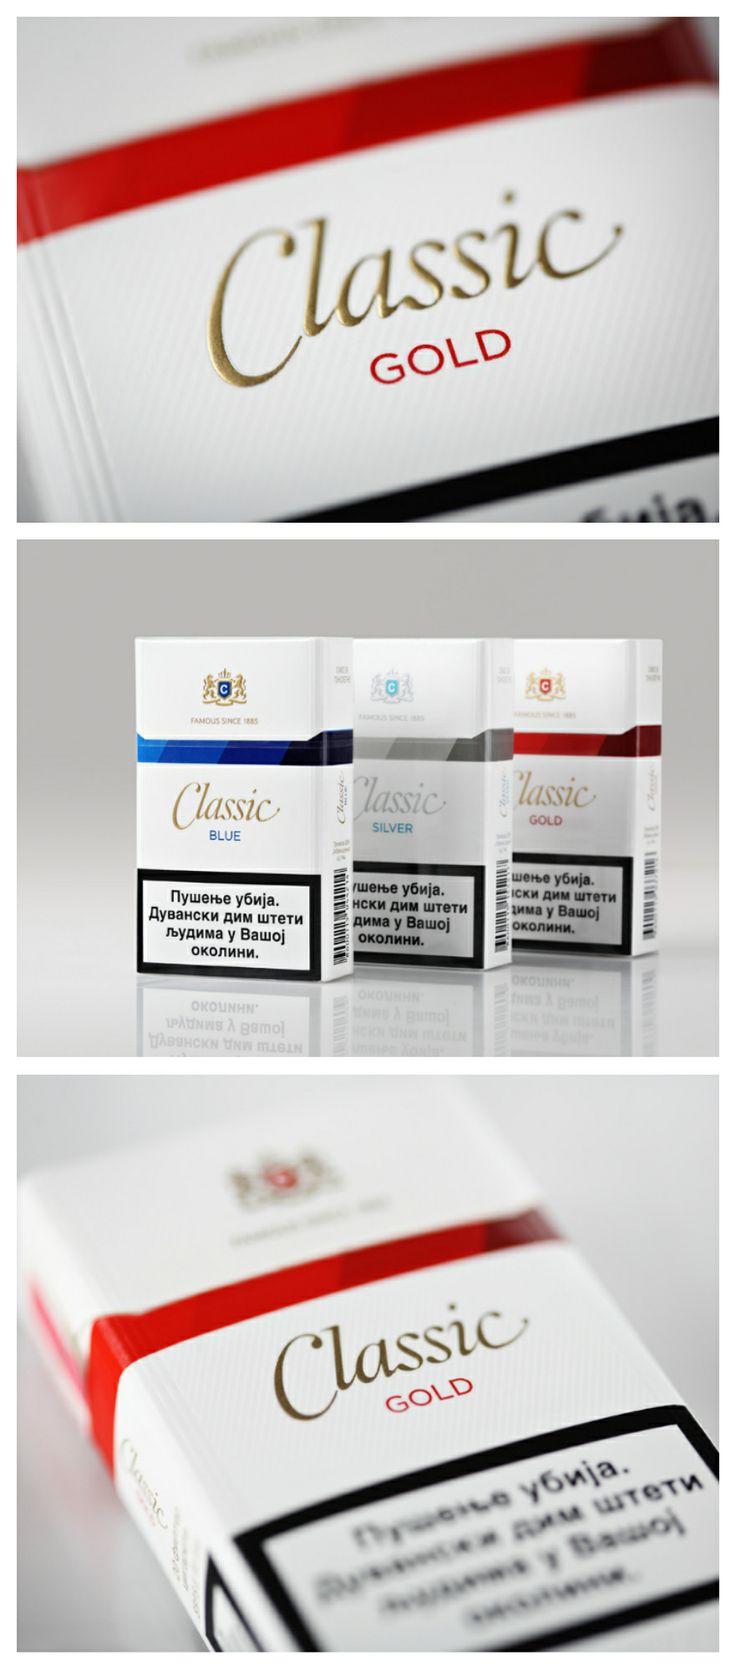 Optimistic view on a cigarette design package.. http://www.cobaassociates.com/portfolio/classic.htm